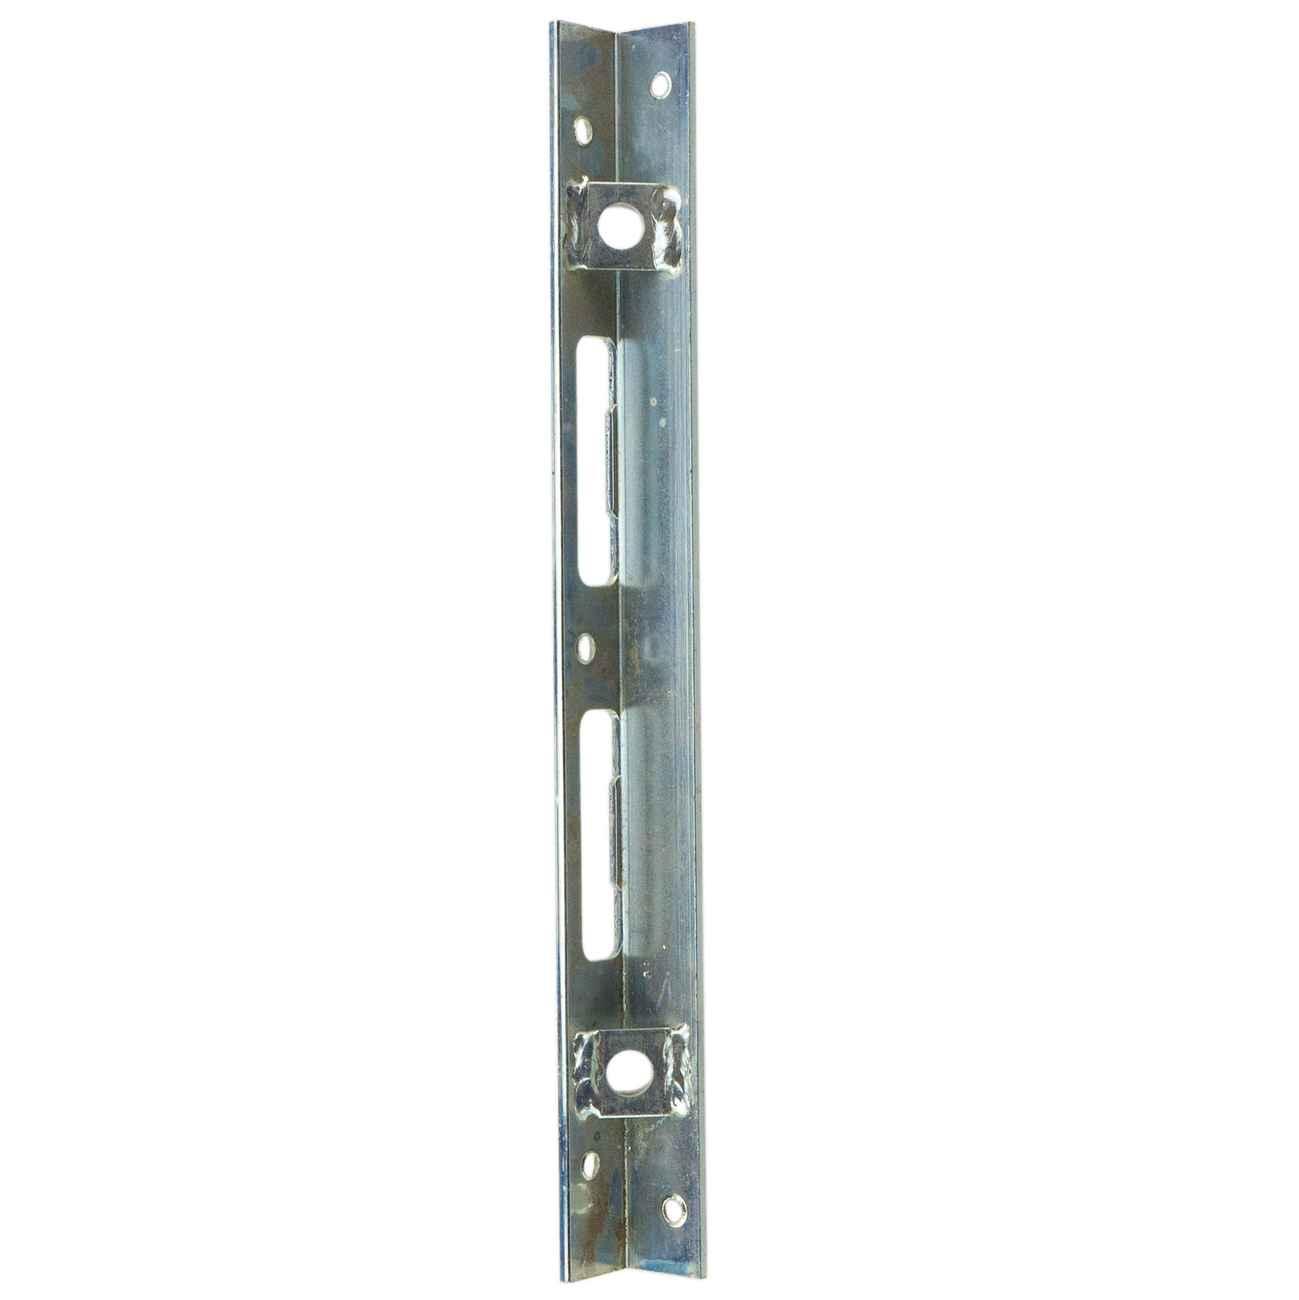 Sicherheits-Schließblech 300x24x24 mm mit Eckverstärkung – Bild 2